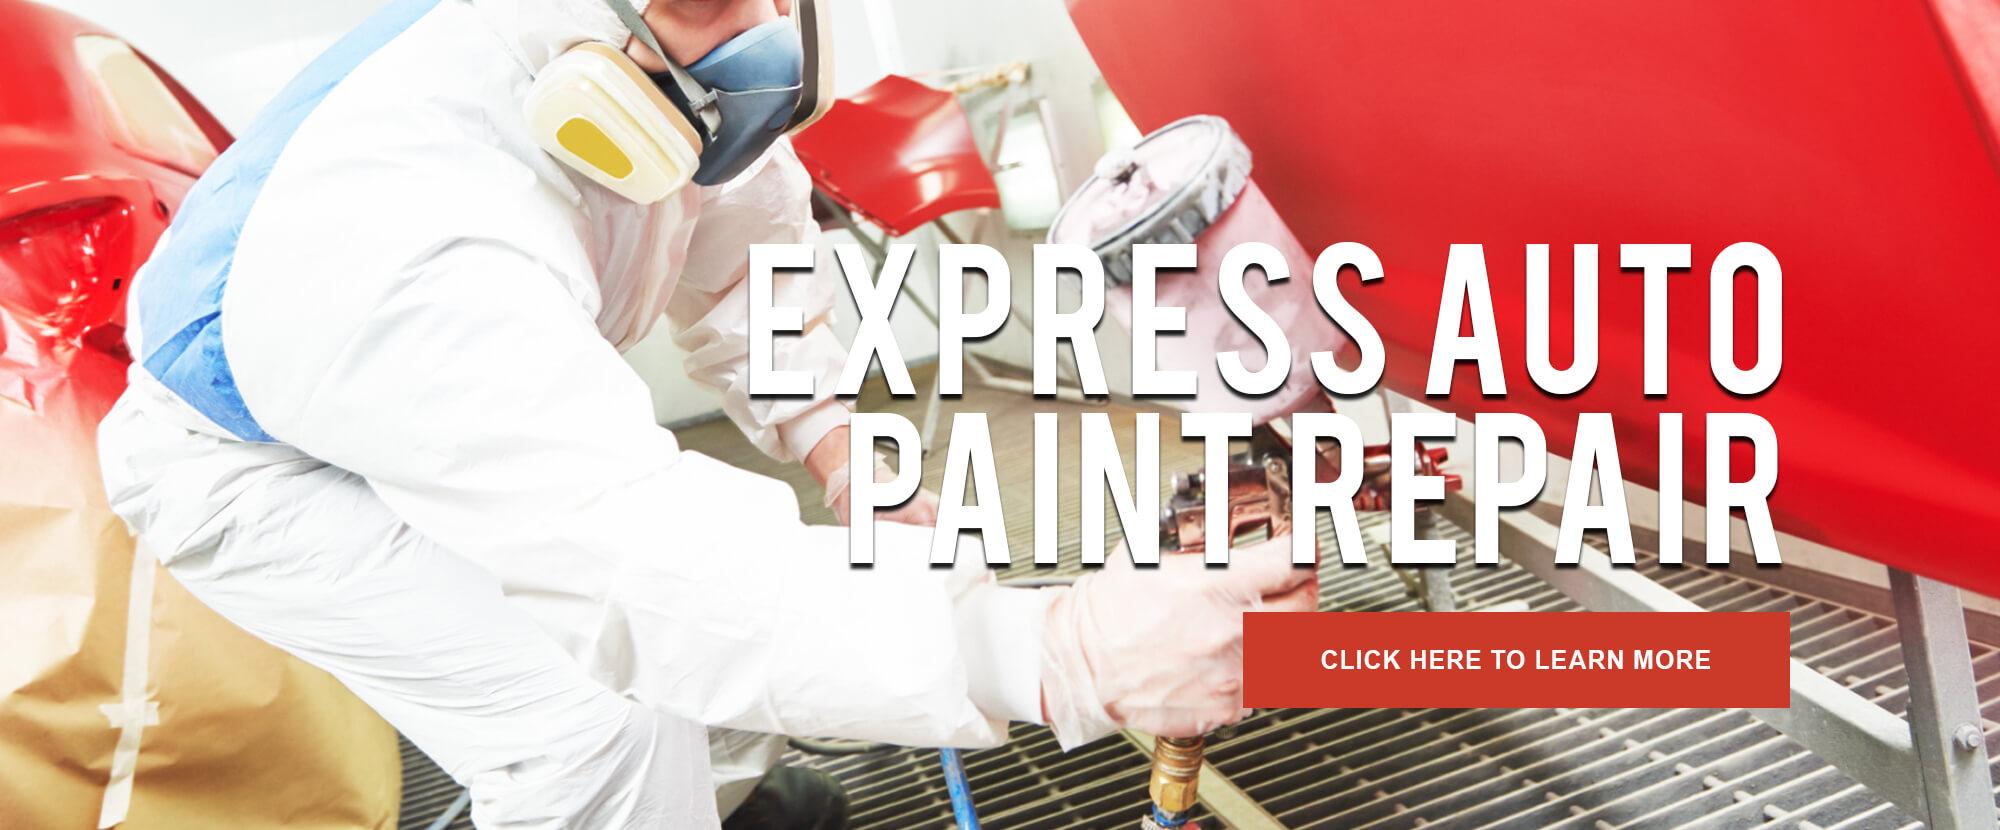 Express Auto Paint Repair